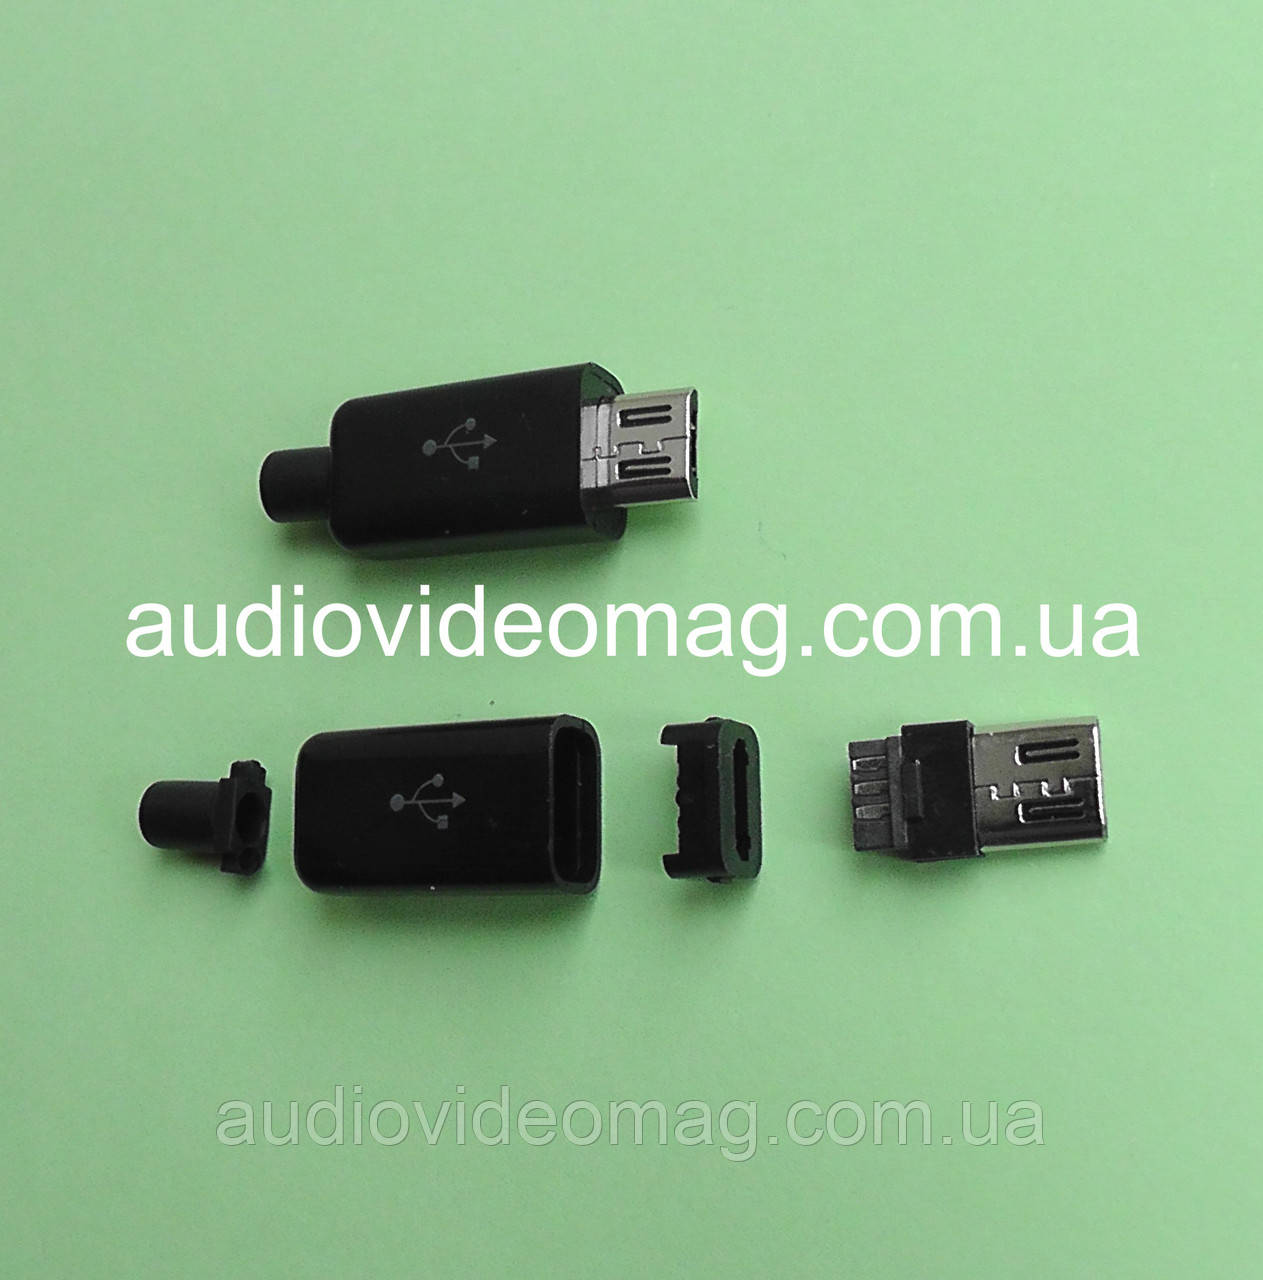 Штекер micro USB 5pin для пайки на кабель, черный